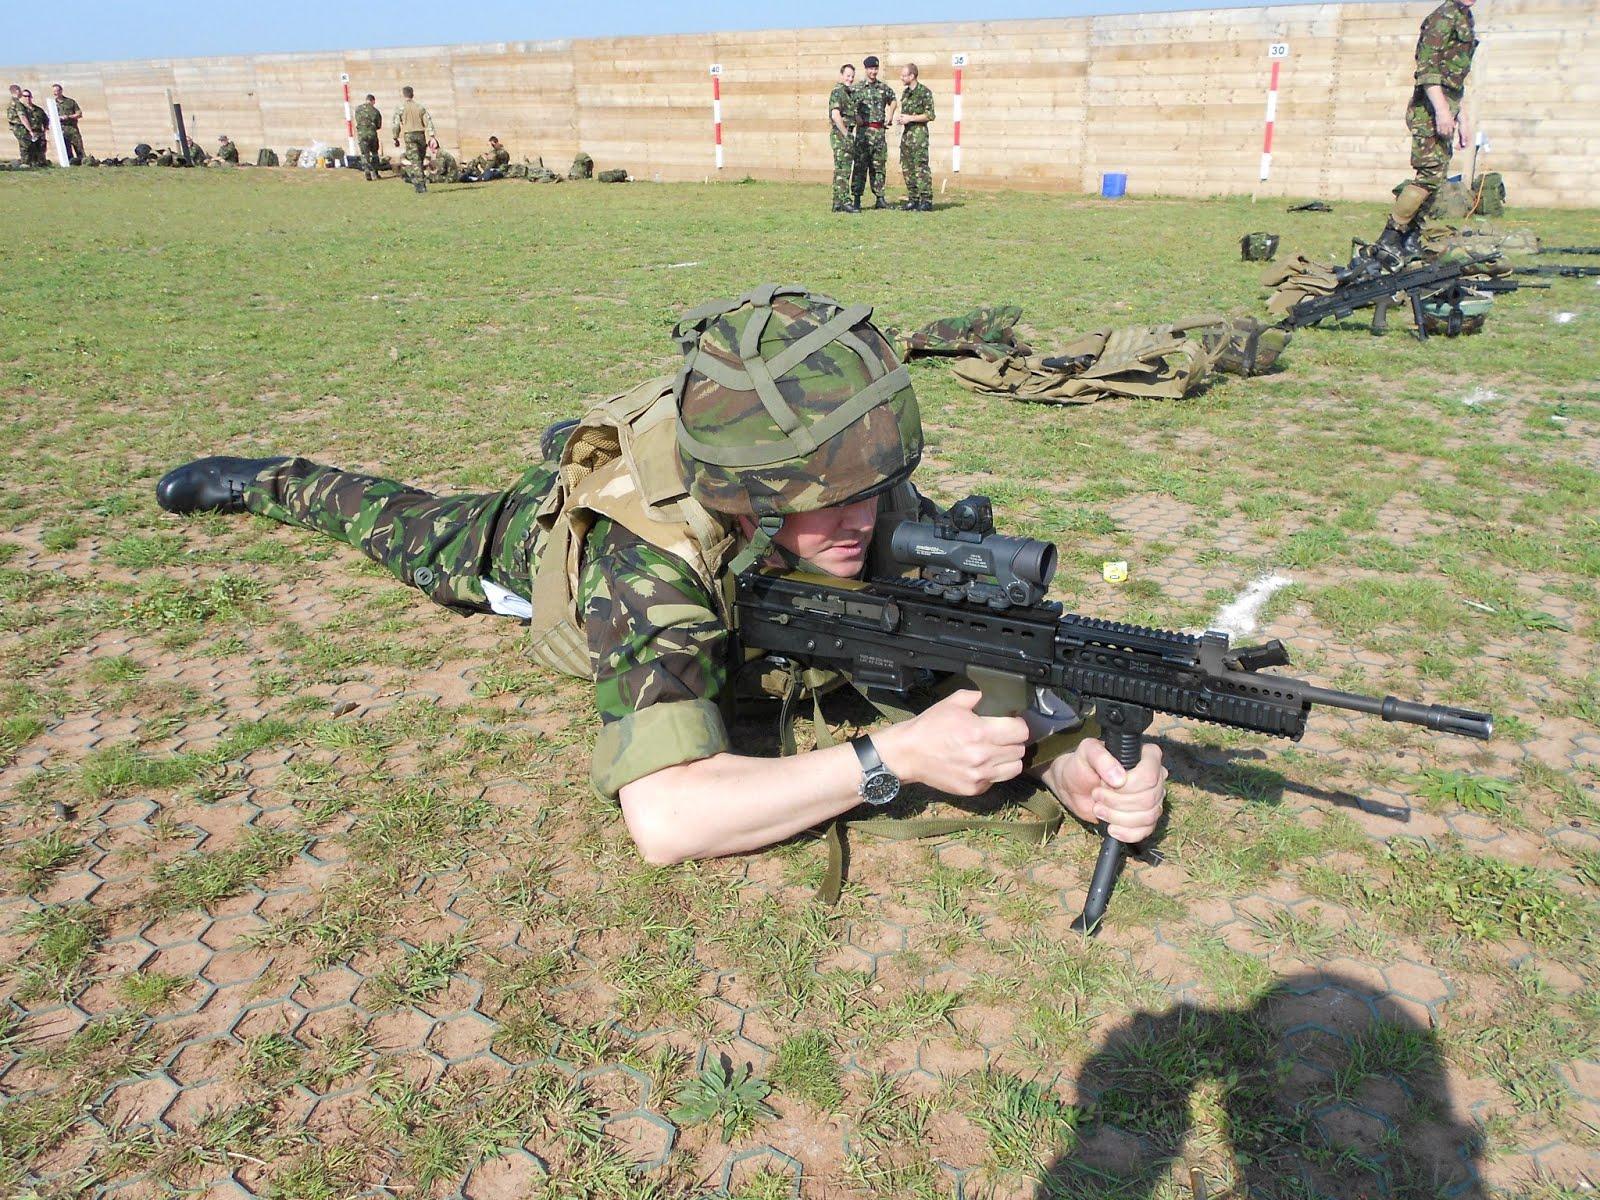 Ashley Fox at Lympstone Commando Training Camp (Photo: Ashley Fox/Facebook)